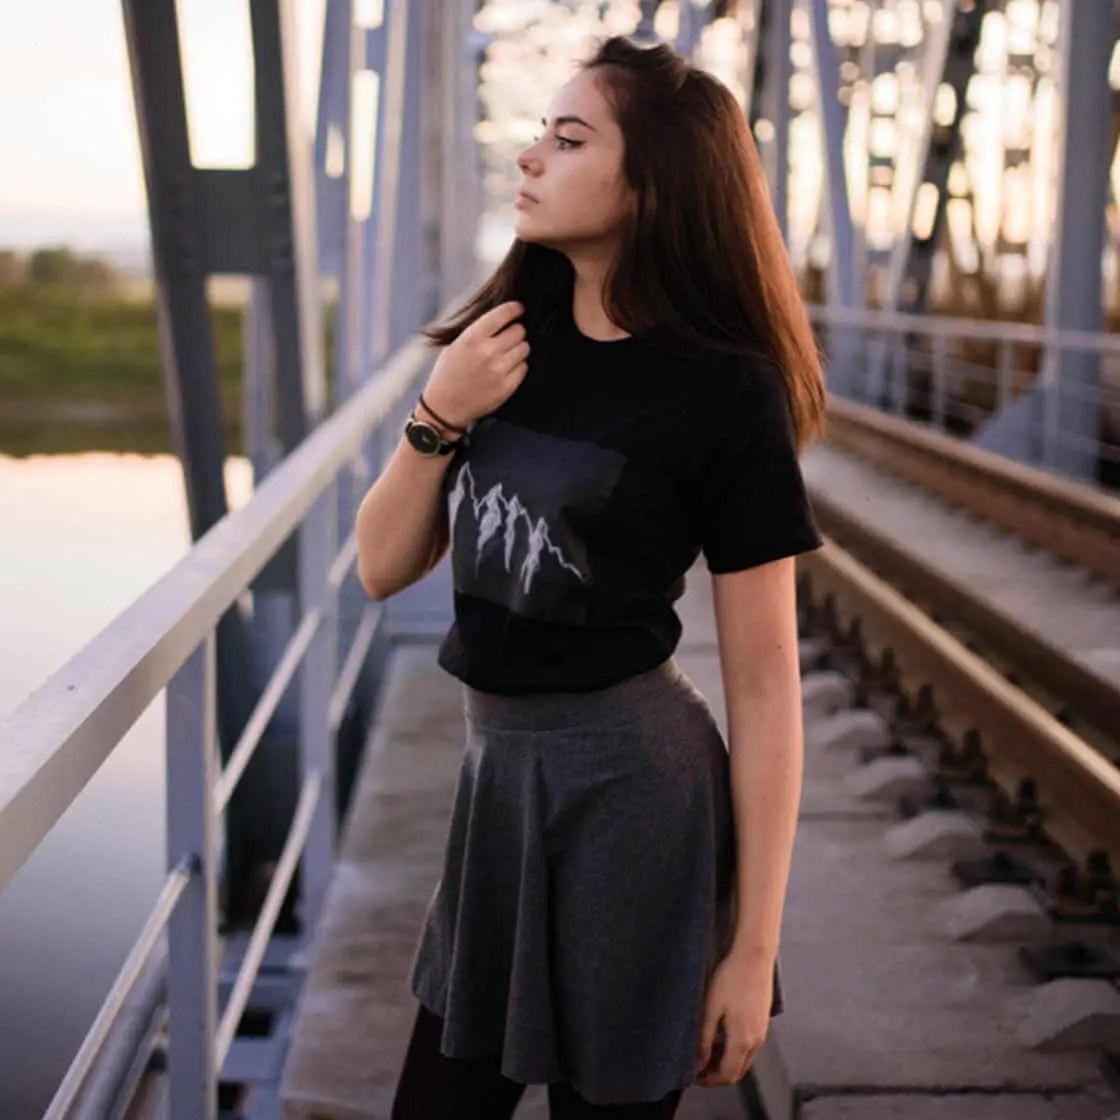 wersm-challky-blackboard-t-shirt-7